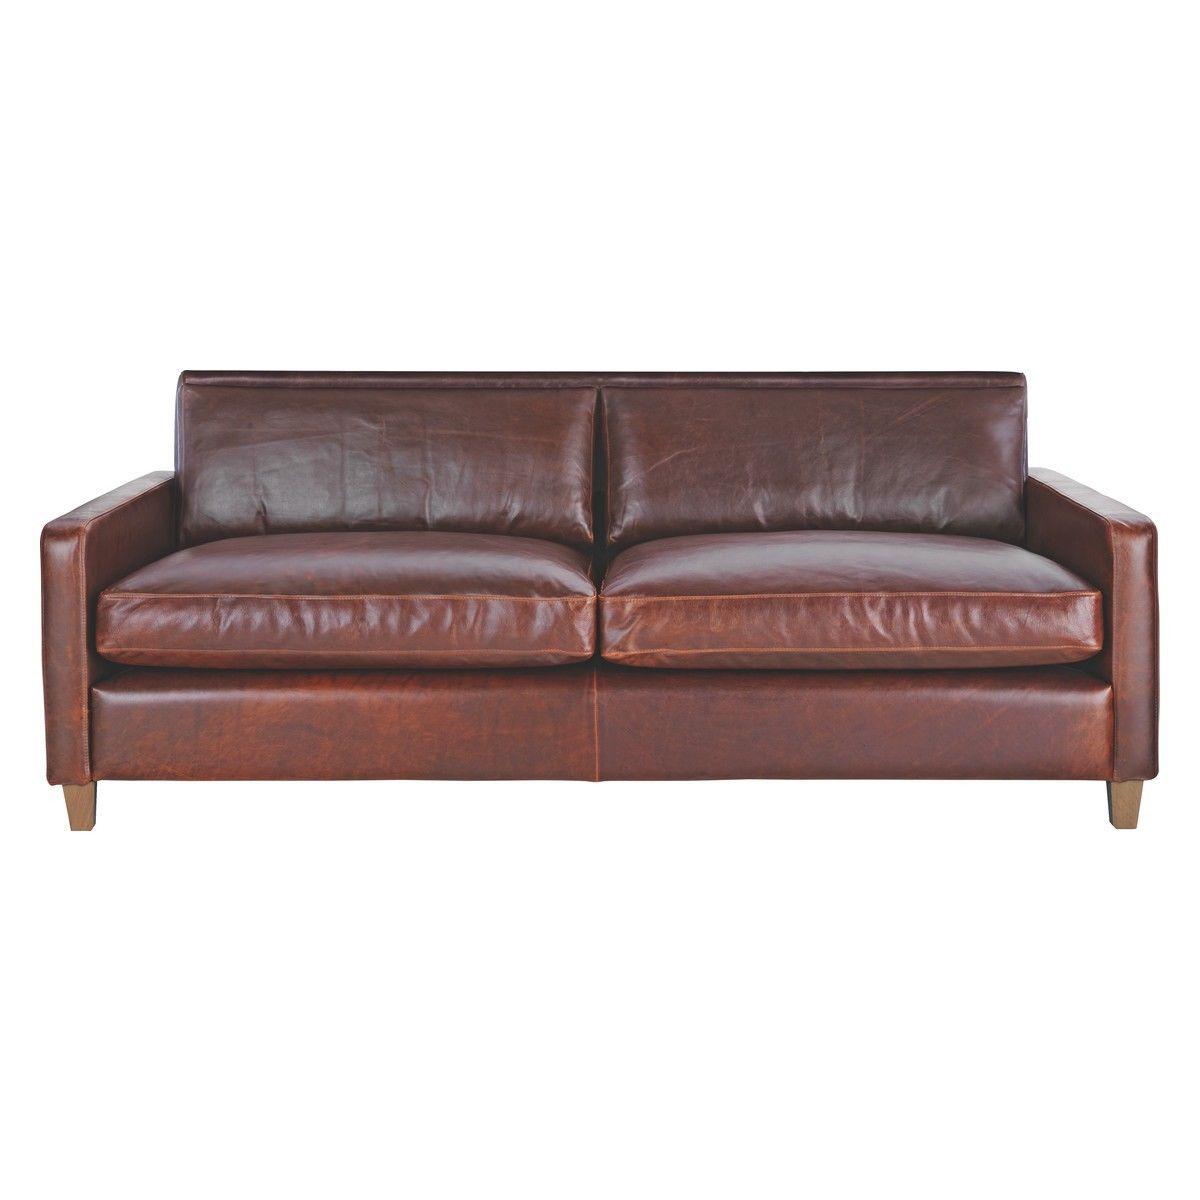 habitat chester sofa leather bed sectional vancouver krimzkramz krimzkramzuk twitter